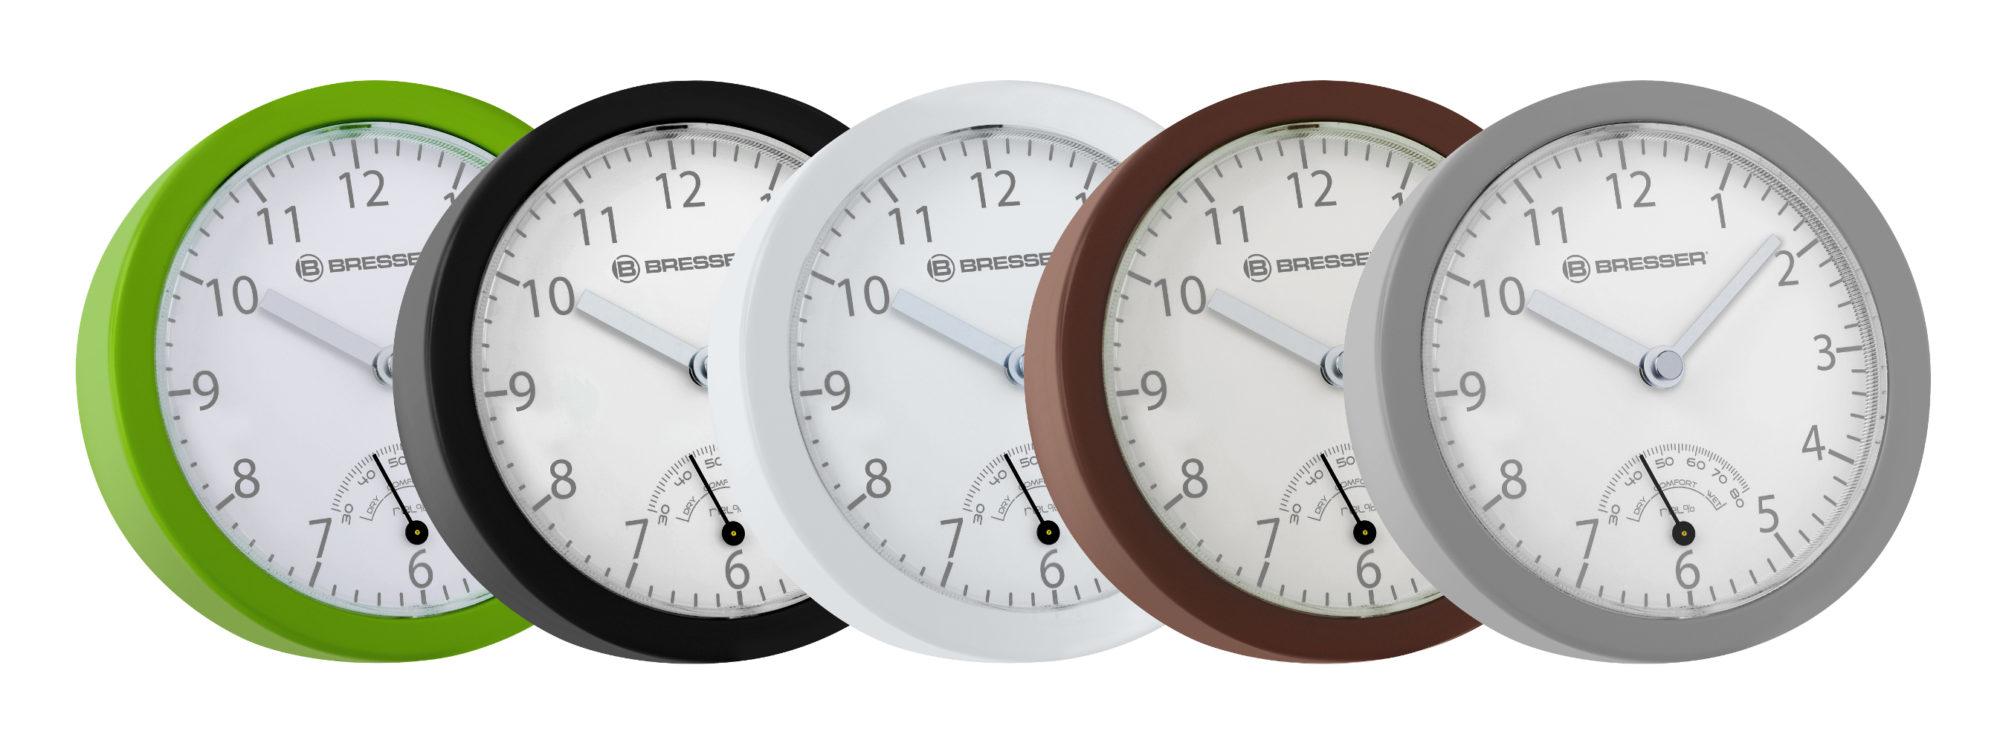 Reloj de ba o bresser mytime bath mini comprar barato aqu - Mecanismo reloj pared barato ...